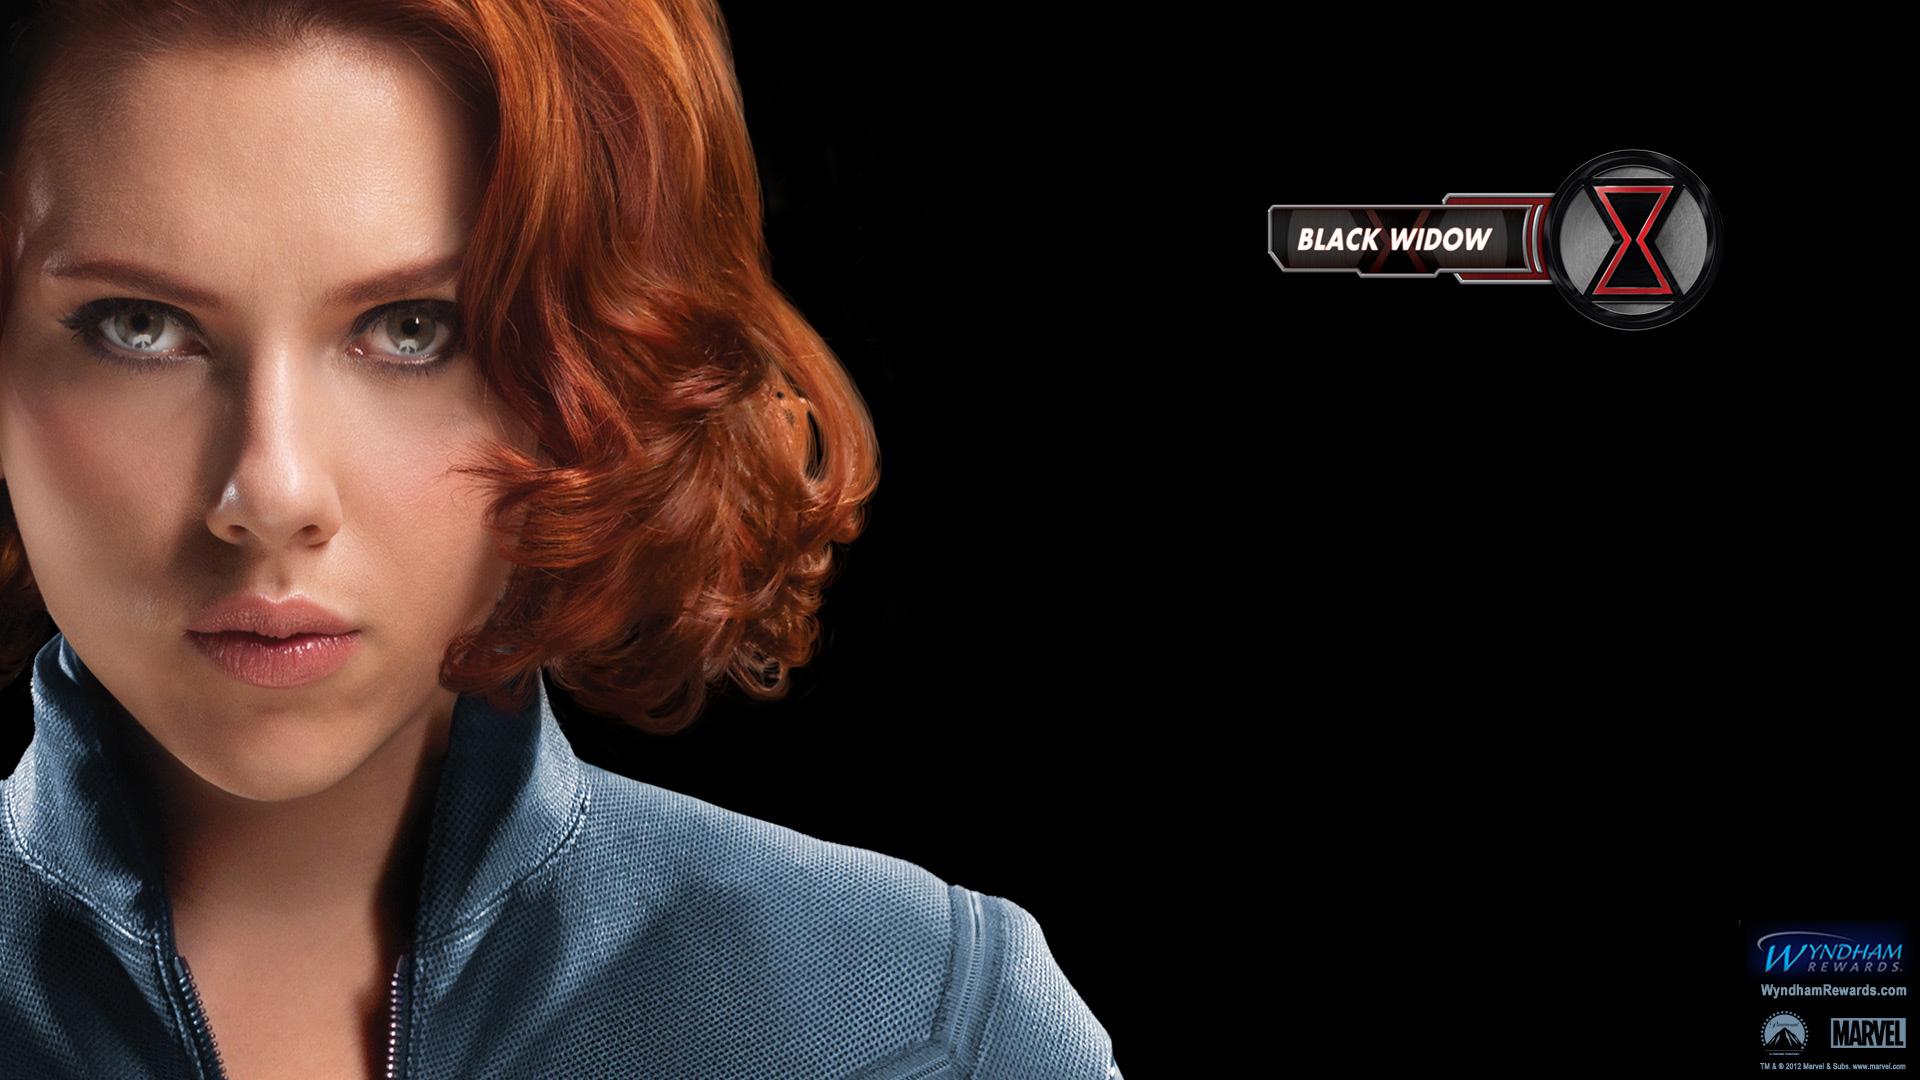 Avengers wallpaper black widow - Natacha avenger ...